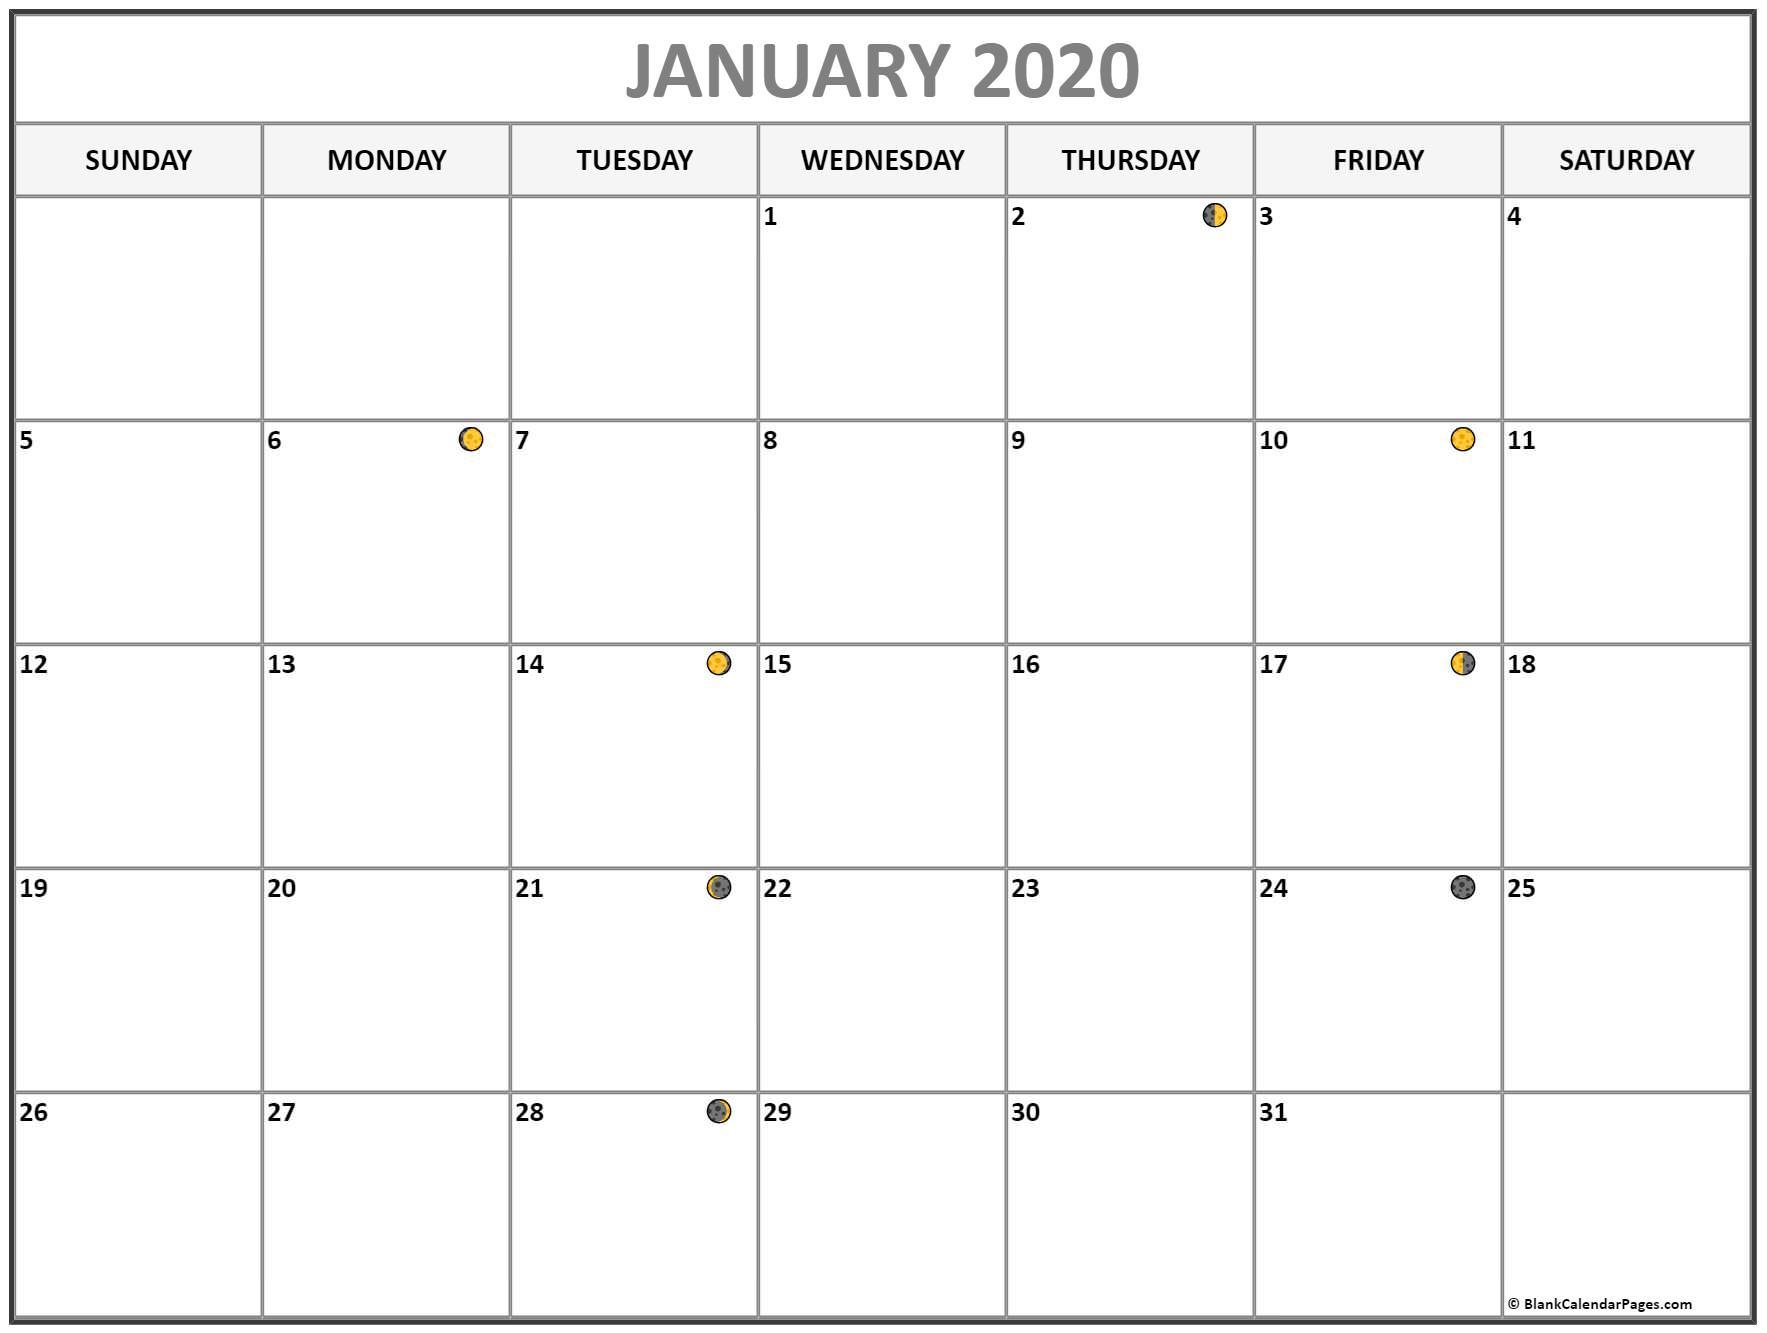 Lunar Calendar January 2020